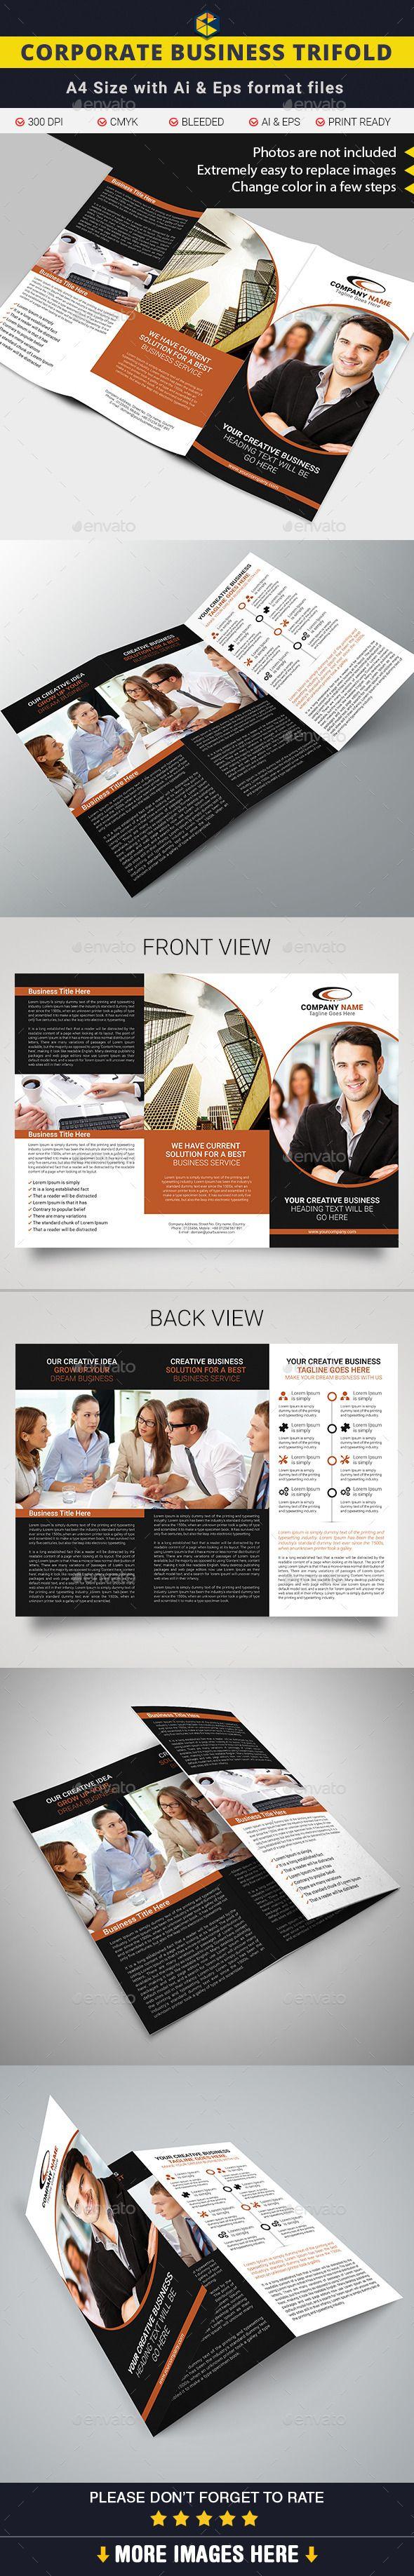 Corporate Business Tri Fold Template #design Download: Http://graphicriver.  Tri Fold BrochureBrochure TemplatePsd ...